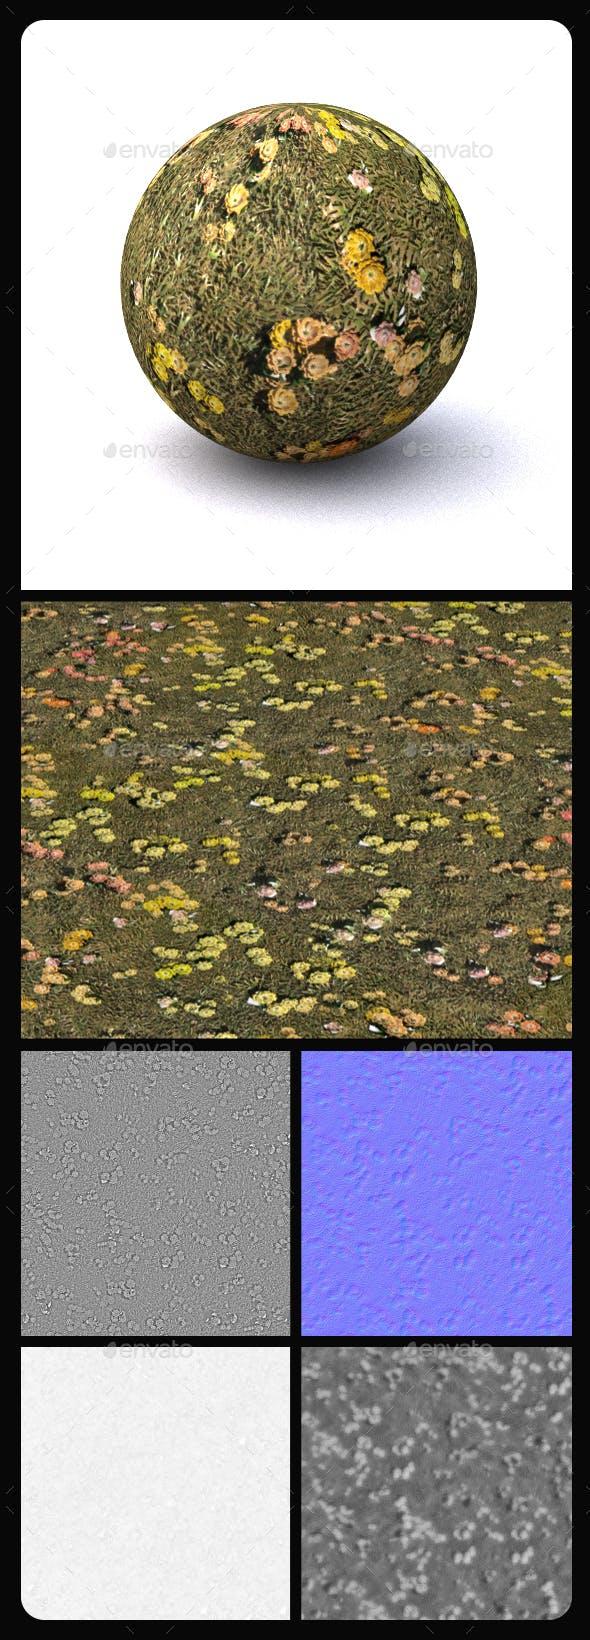 Grass Tile Texture 3 - 3DOcean Item for Sale